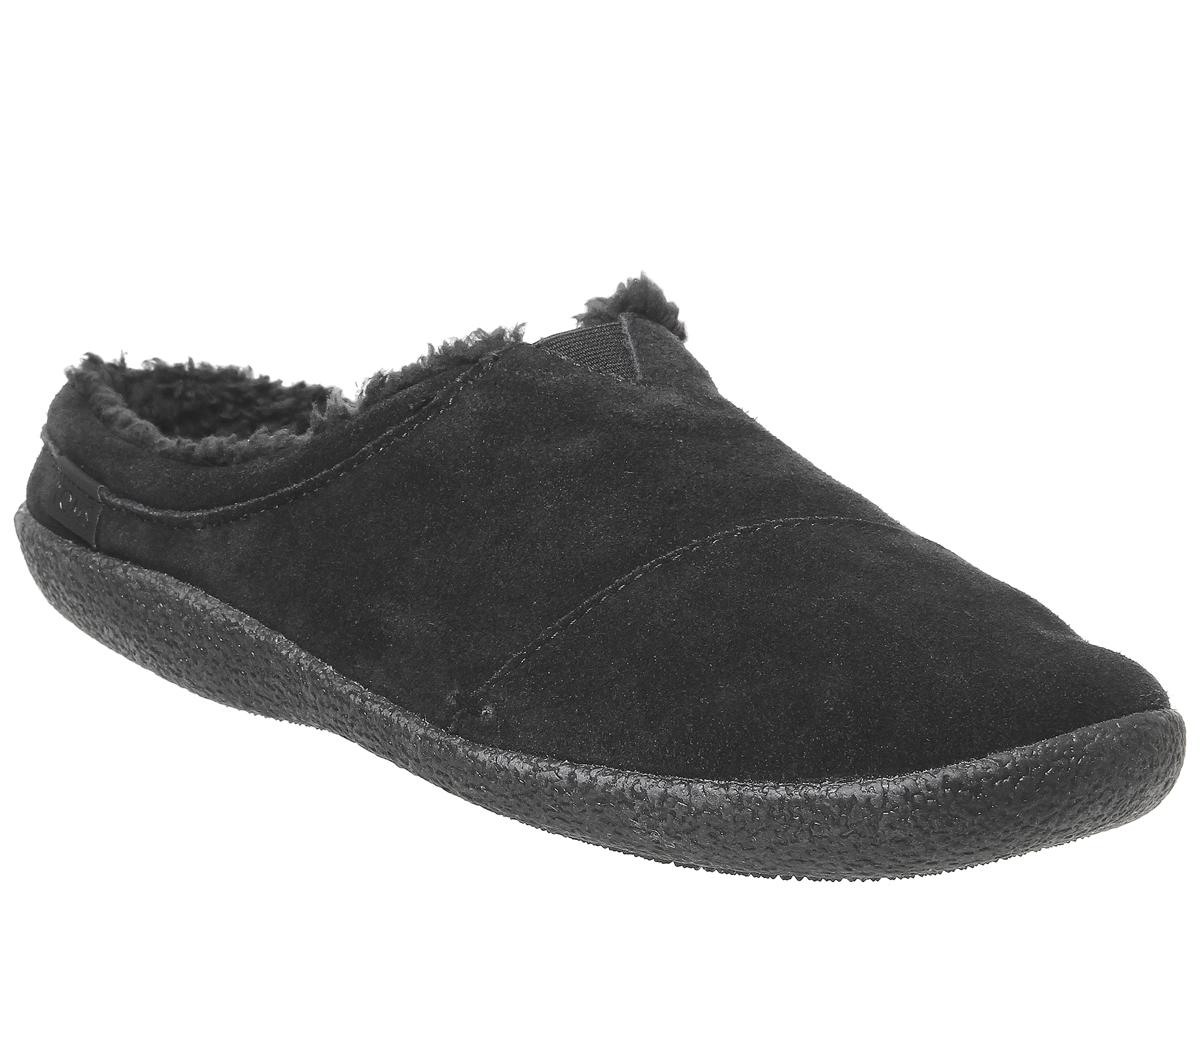 Berlkeley Slippers